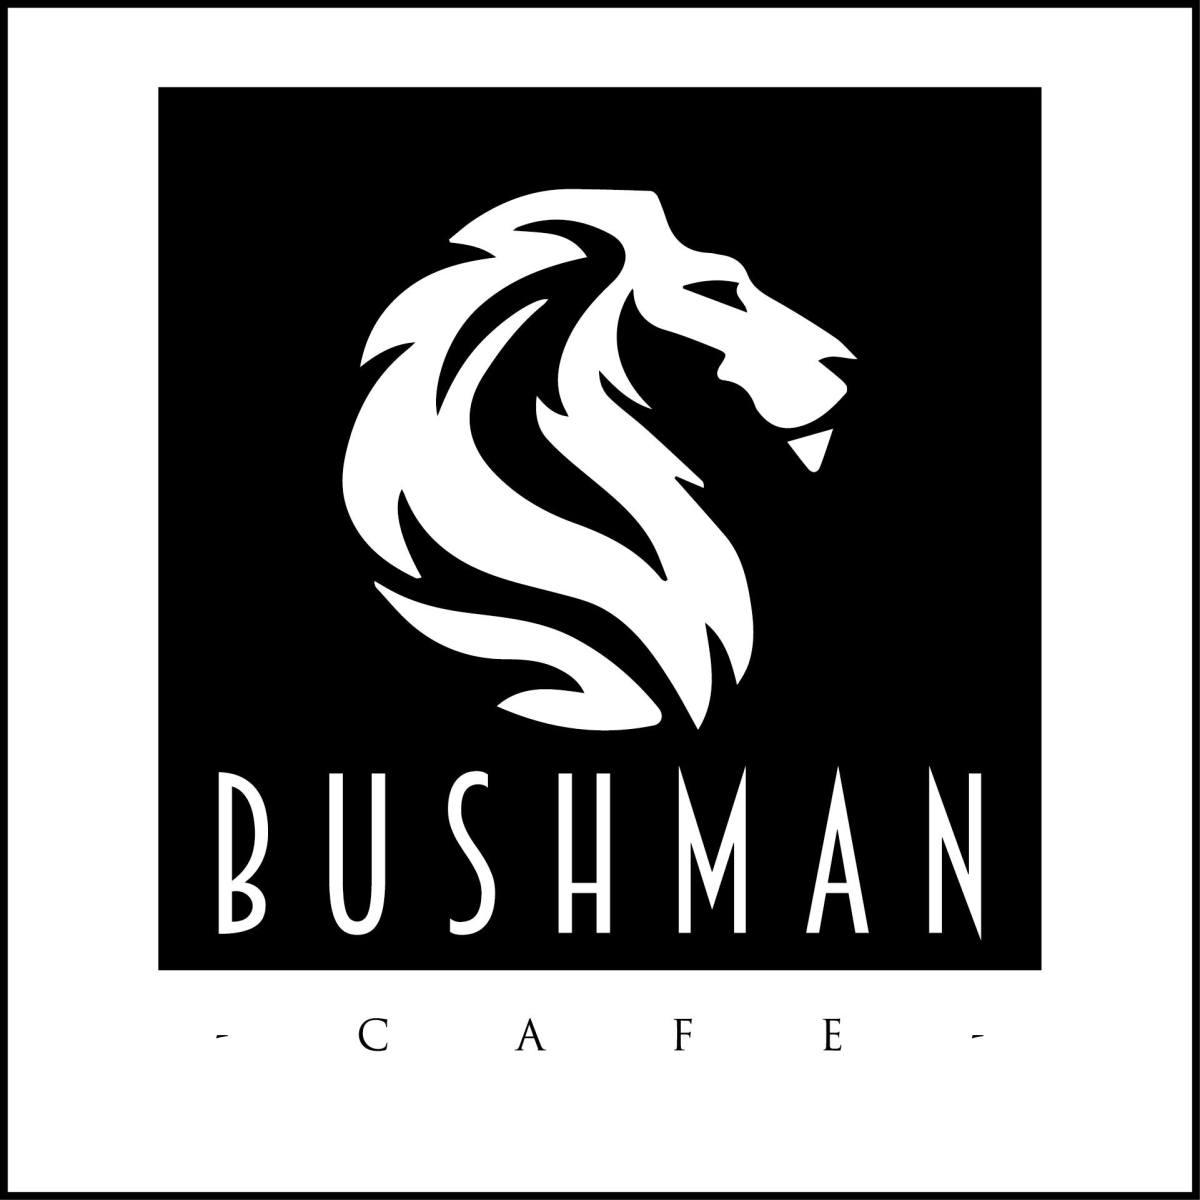 Bushman Café - Le Café Hotel